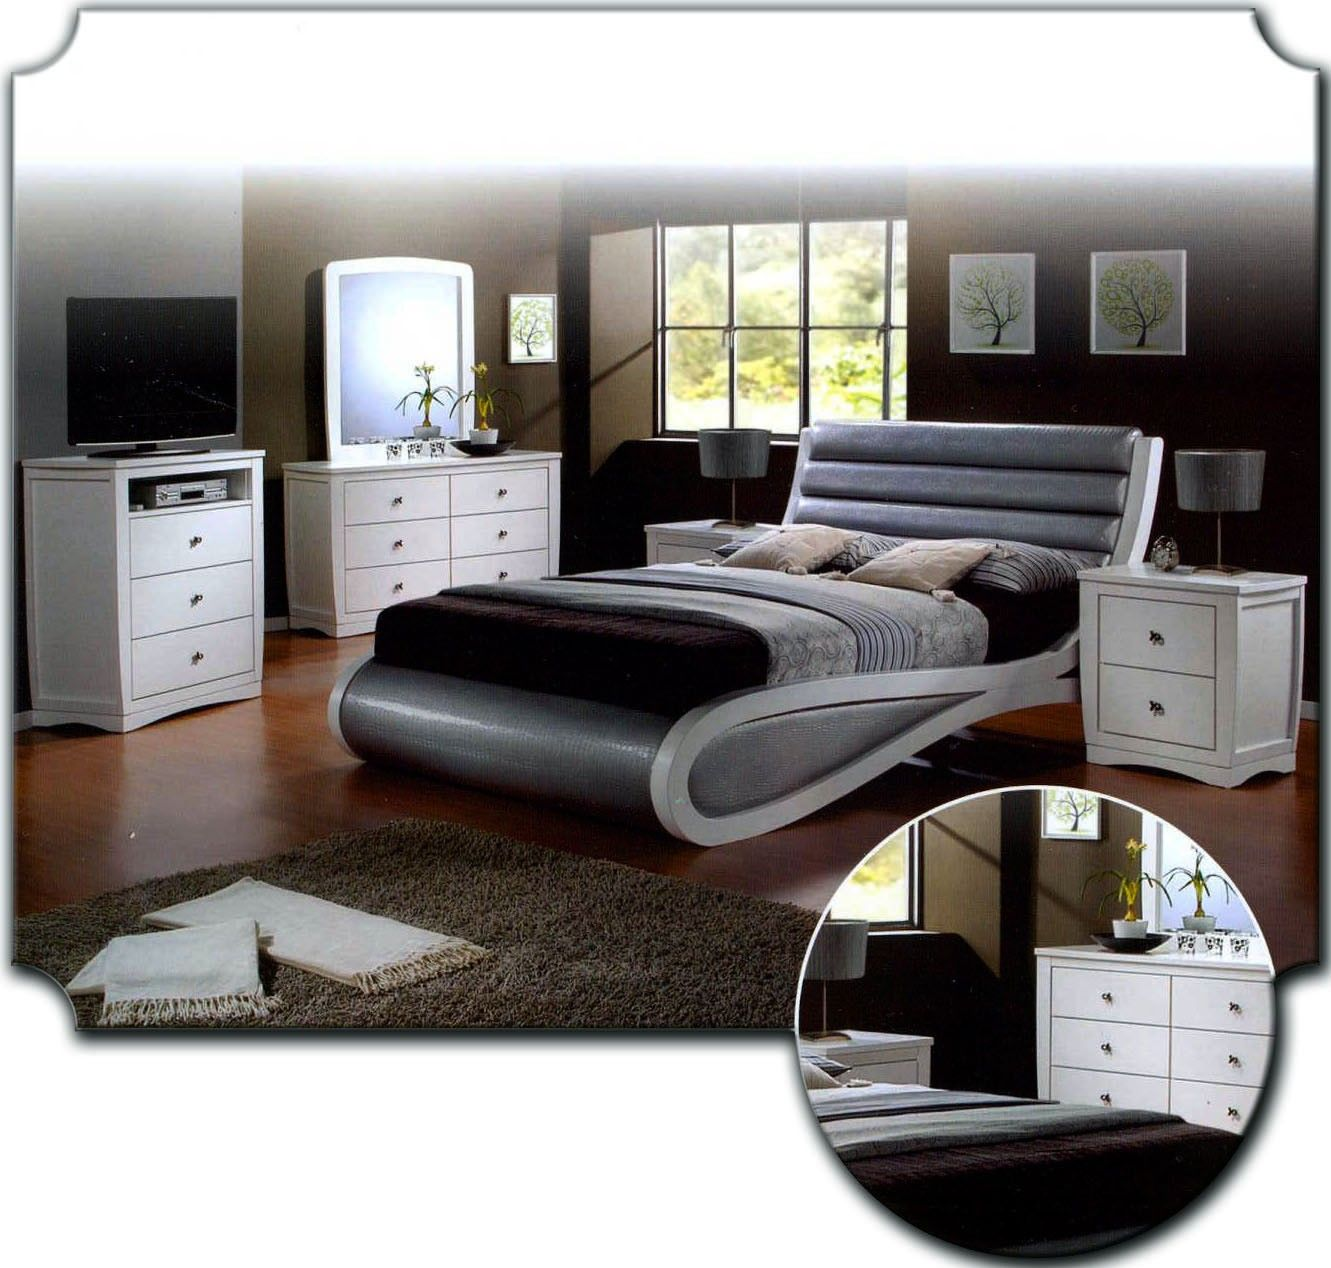 Bedroom-Ideas-For-Teenage-Guys-Teen-Platform-Bedroom-Sets ... on Teenage Room Colors For Guys  id=19603